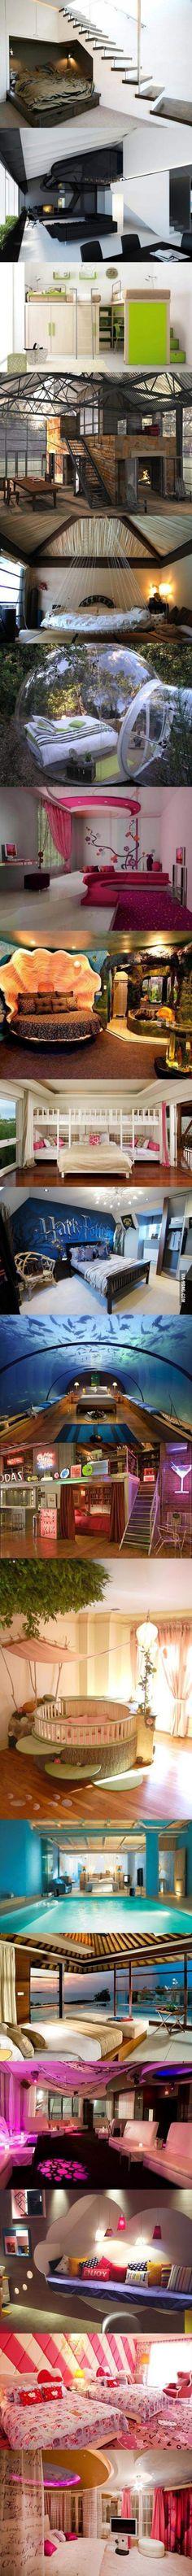 9GAG - Dream Bedrooms